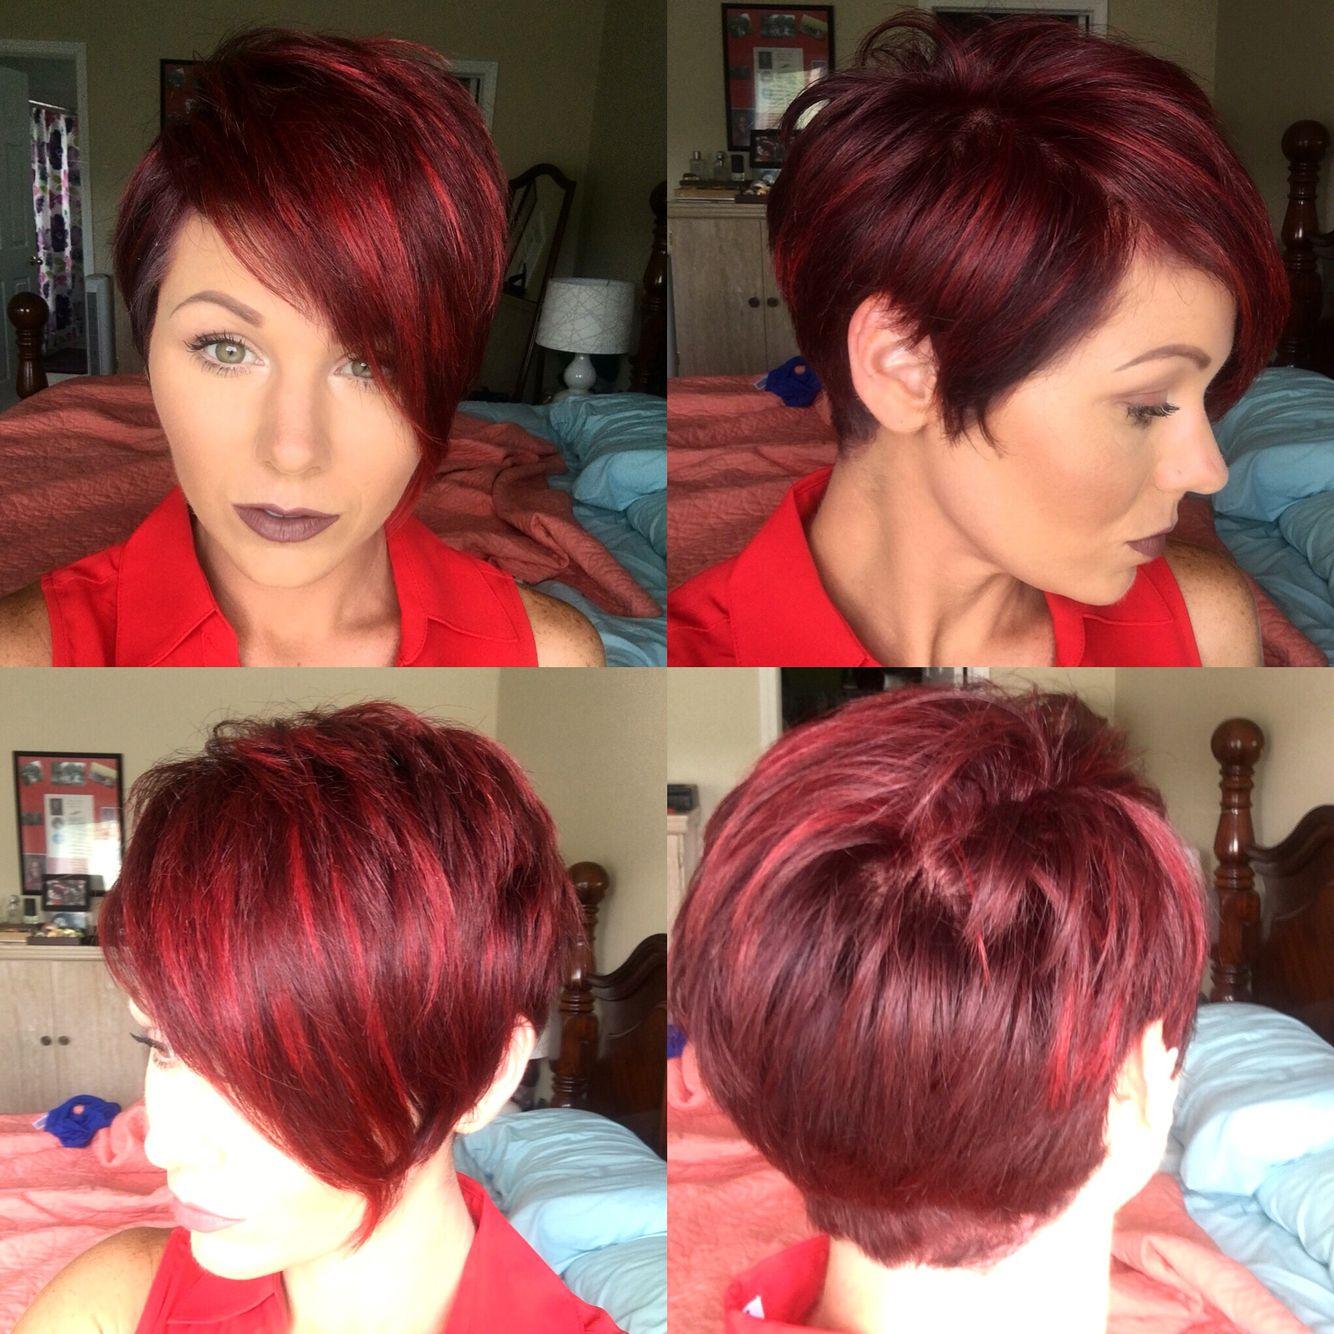 Pixie redhair u pinteresu